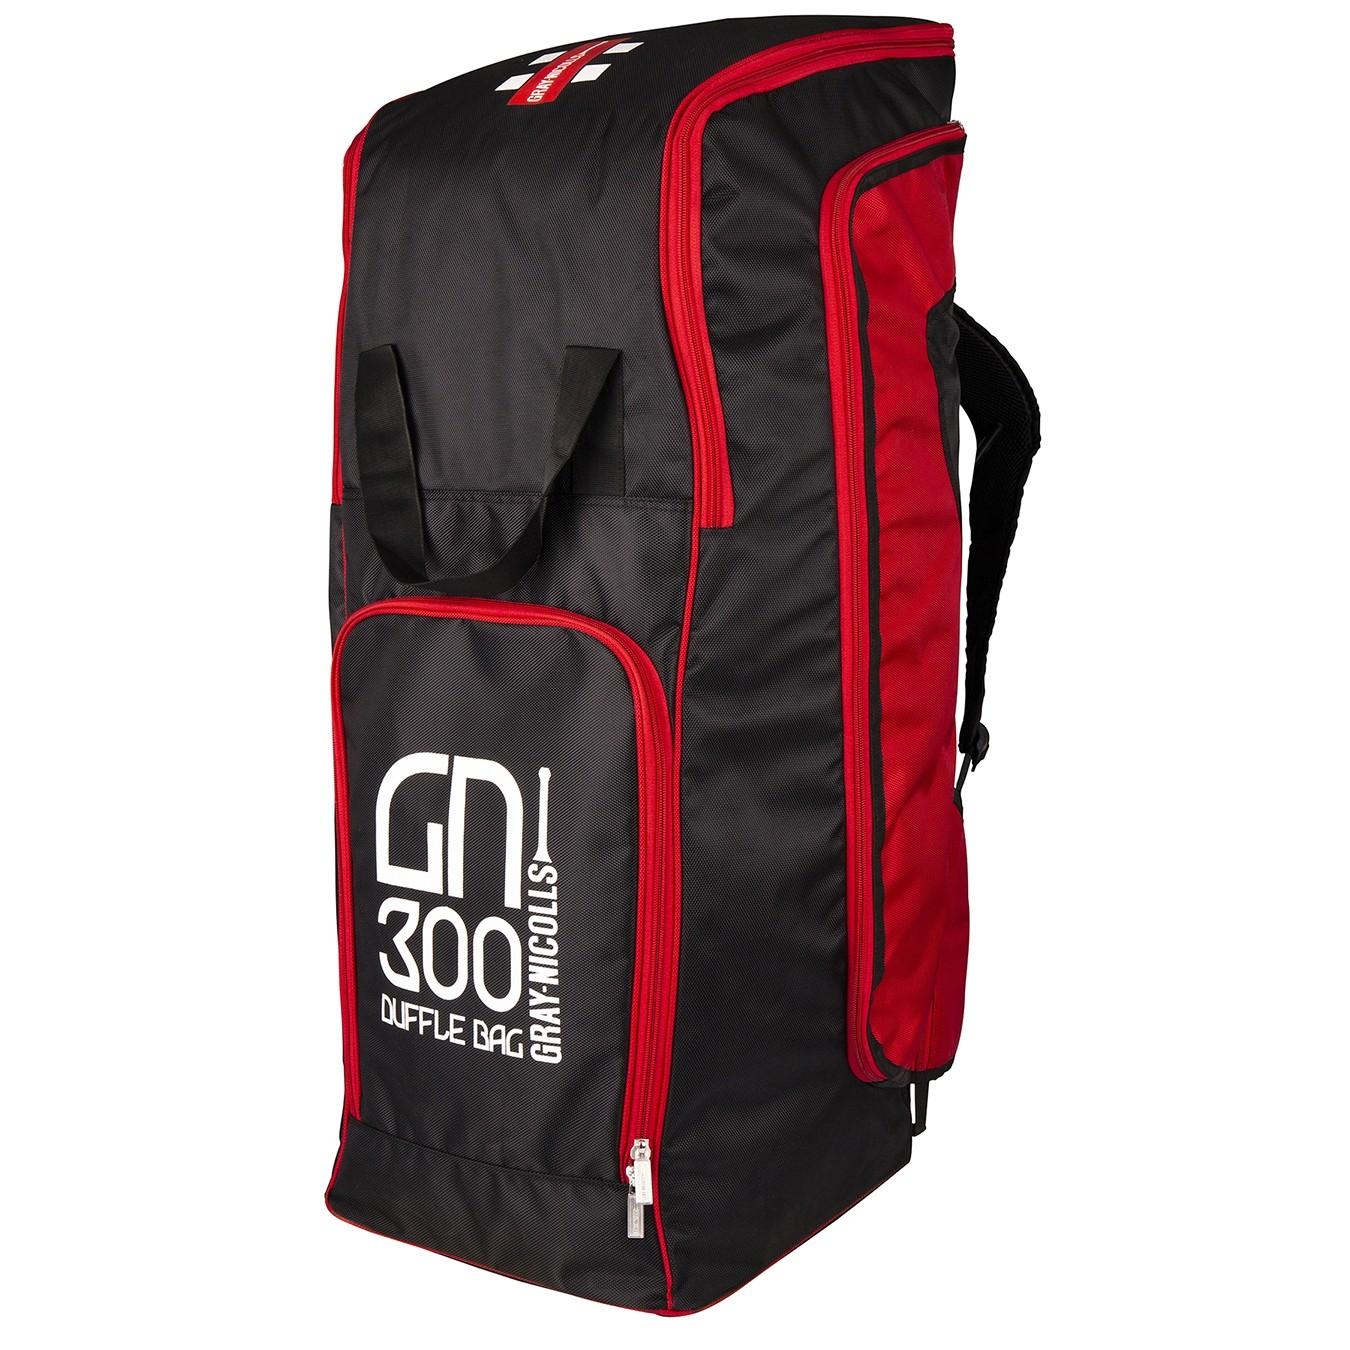 2021 Gray Nicolls GN 300 Duffle Cricket Bag - Black & Red